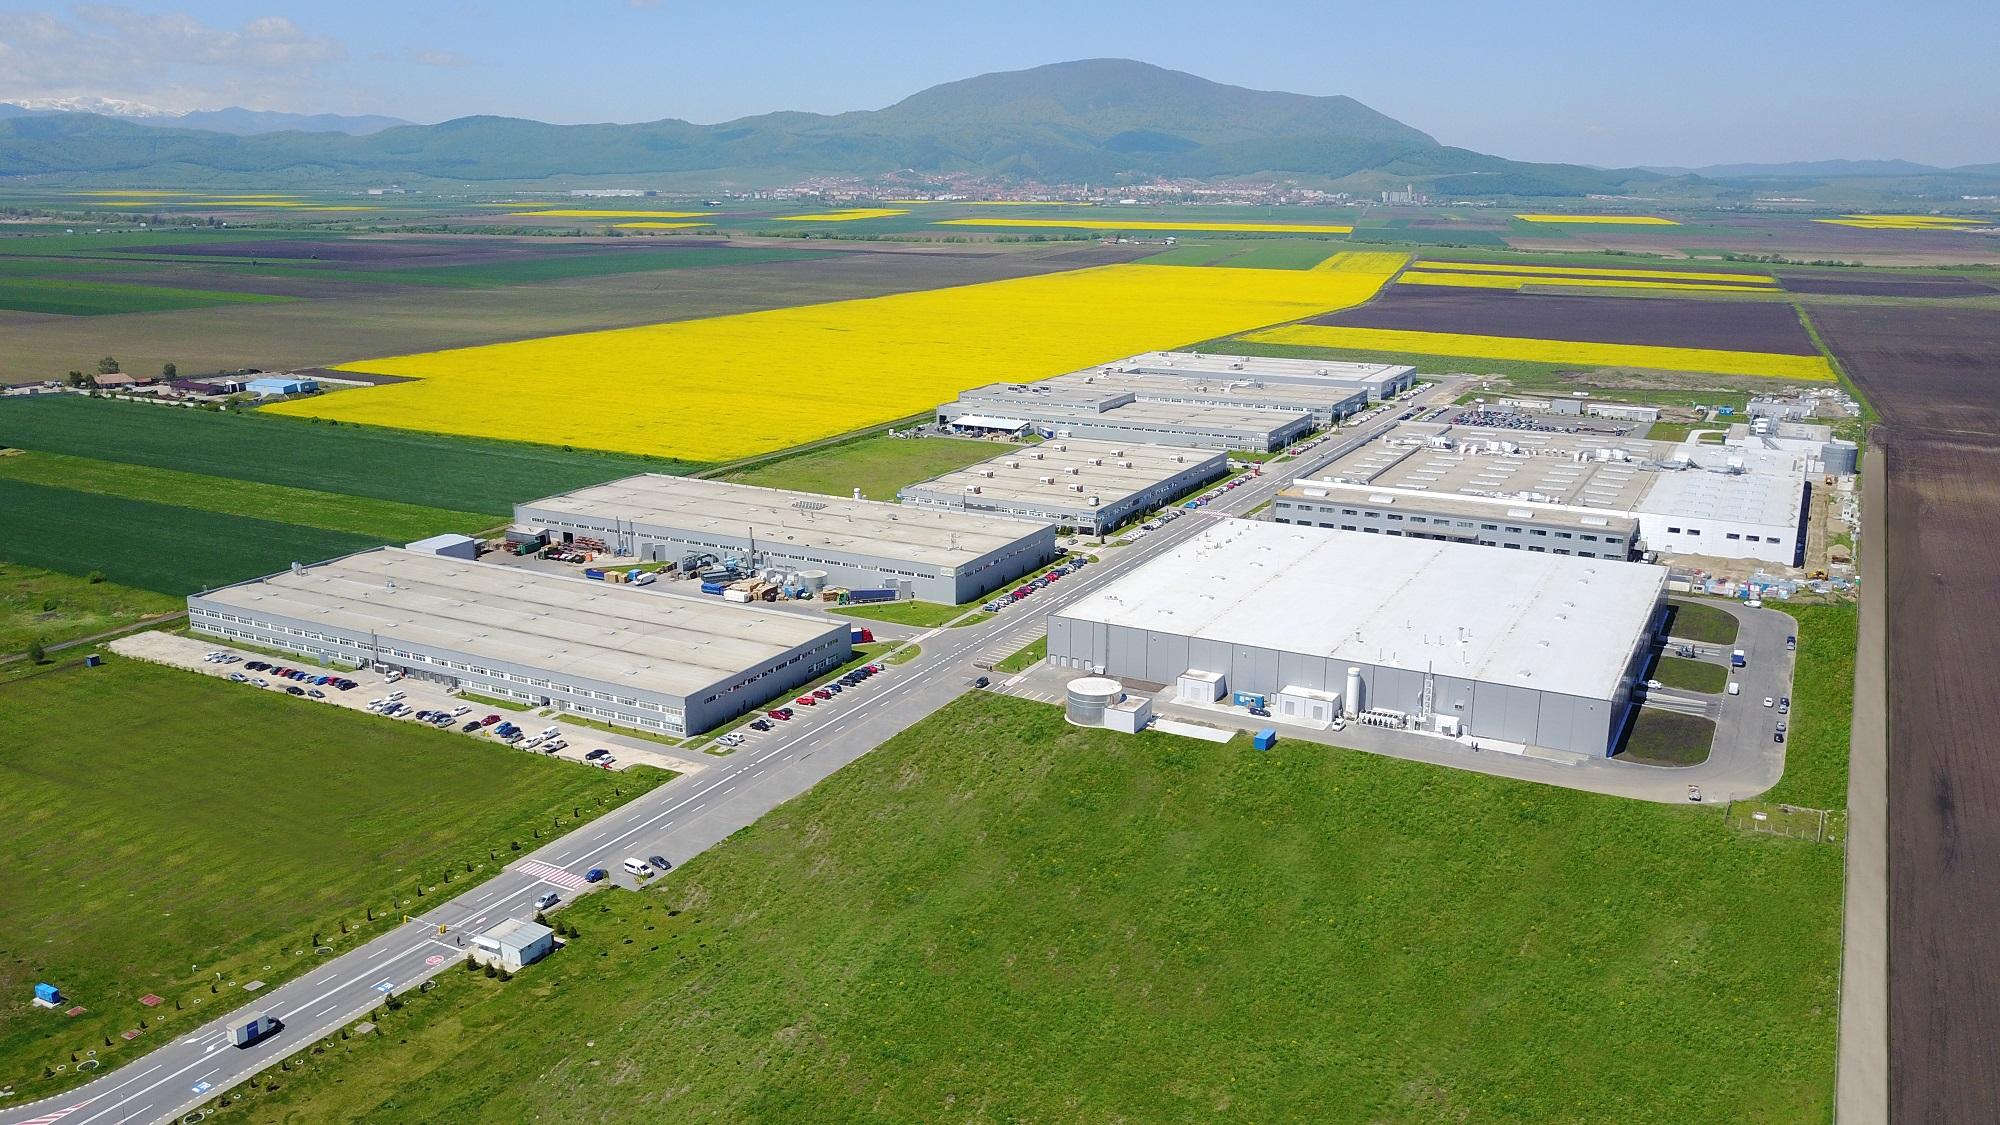 Sennheiser va construi în România  noua sa fabrică